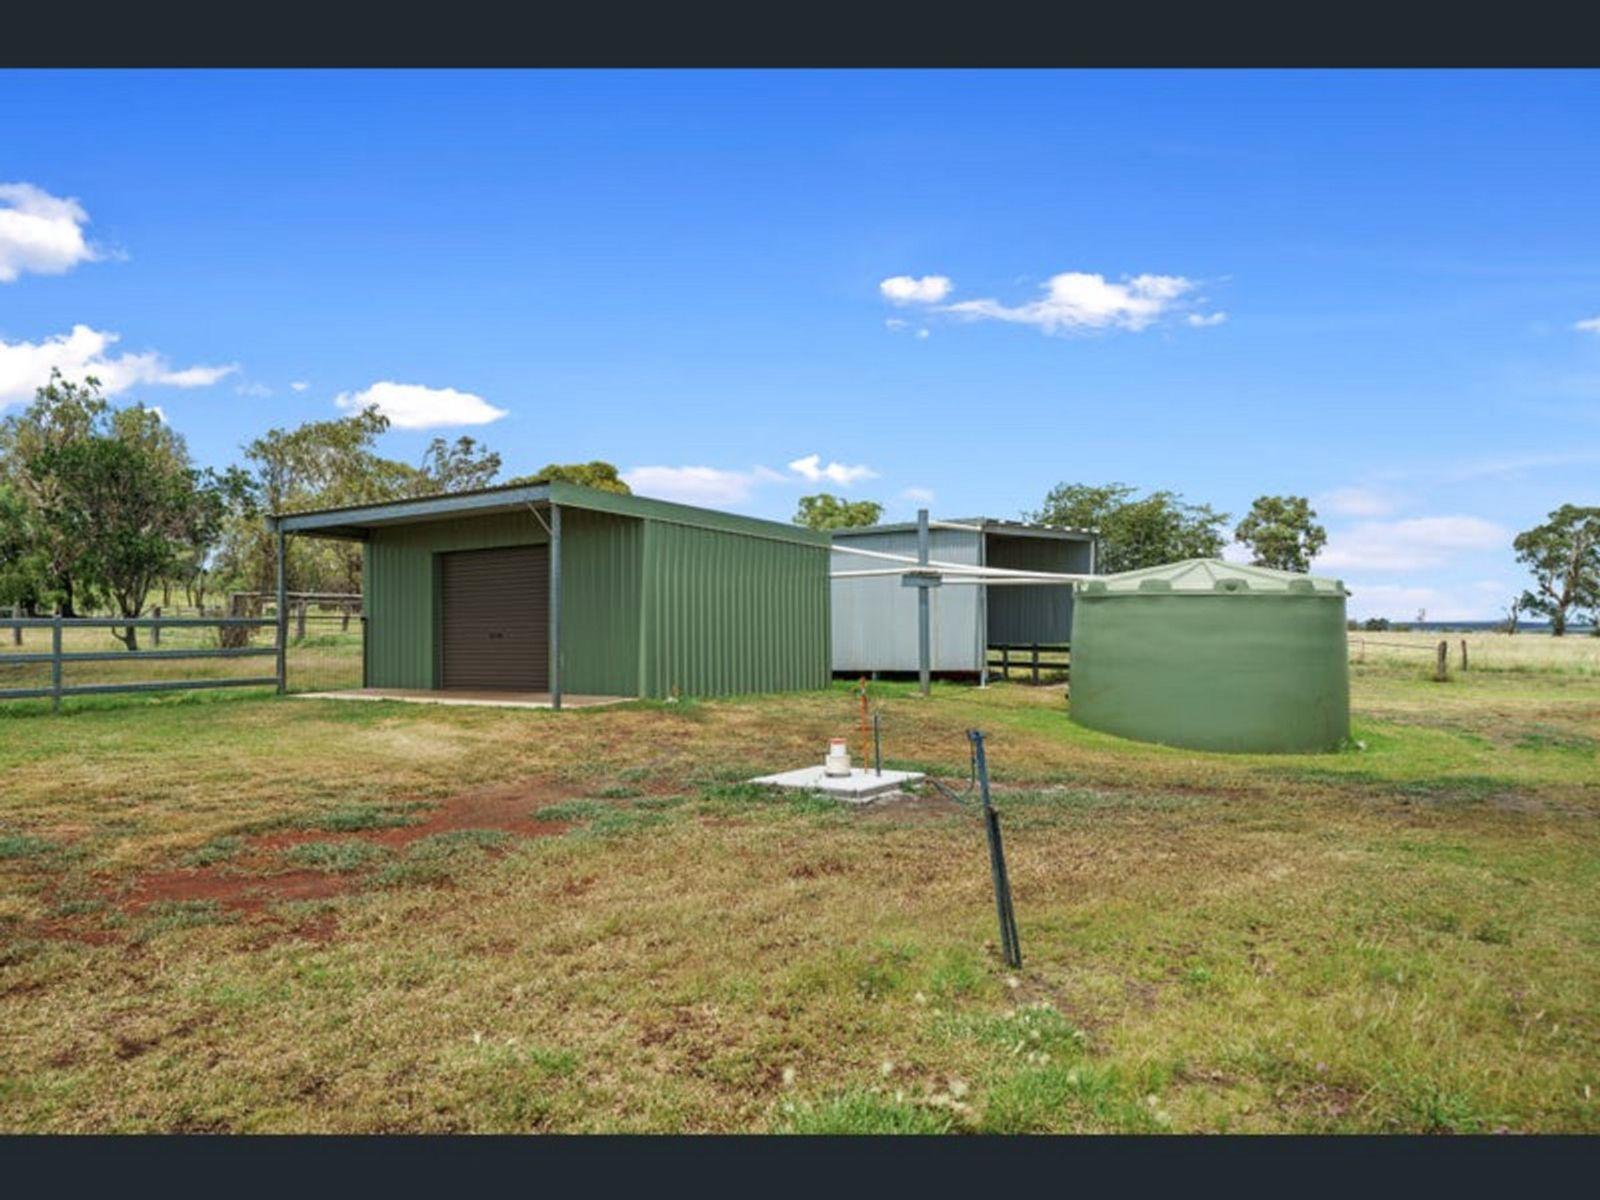 34 Gowrie Mountain School Road, Kingsthorpe, QLD 4400